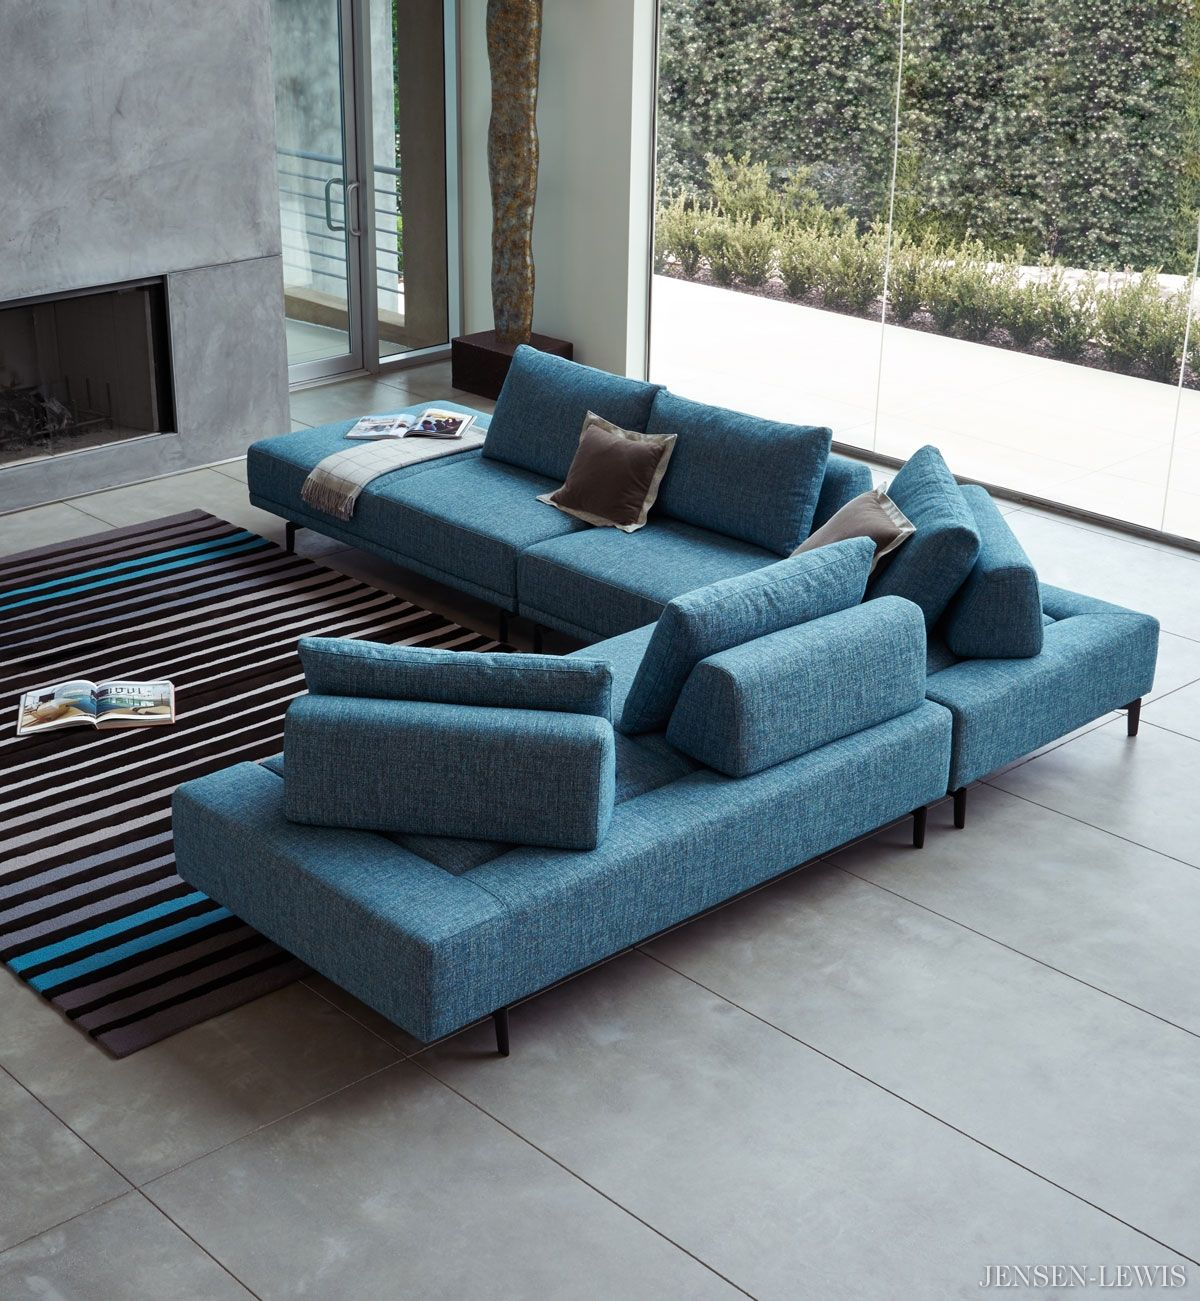 Pin By May Li On Interior Design Modular Sectional Sofa Living Room Sofa Design Luxury Furniture